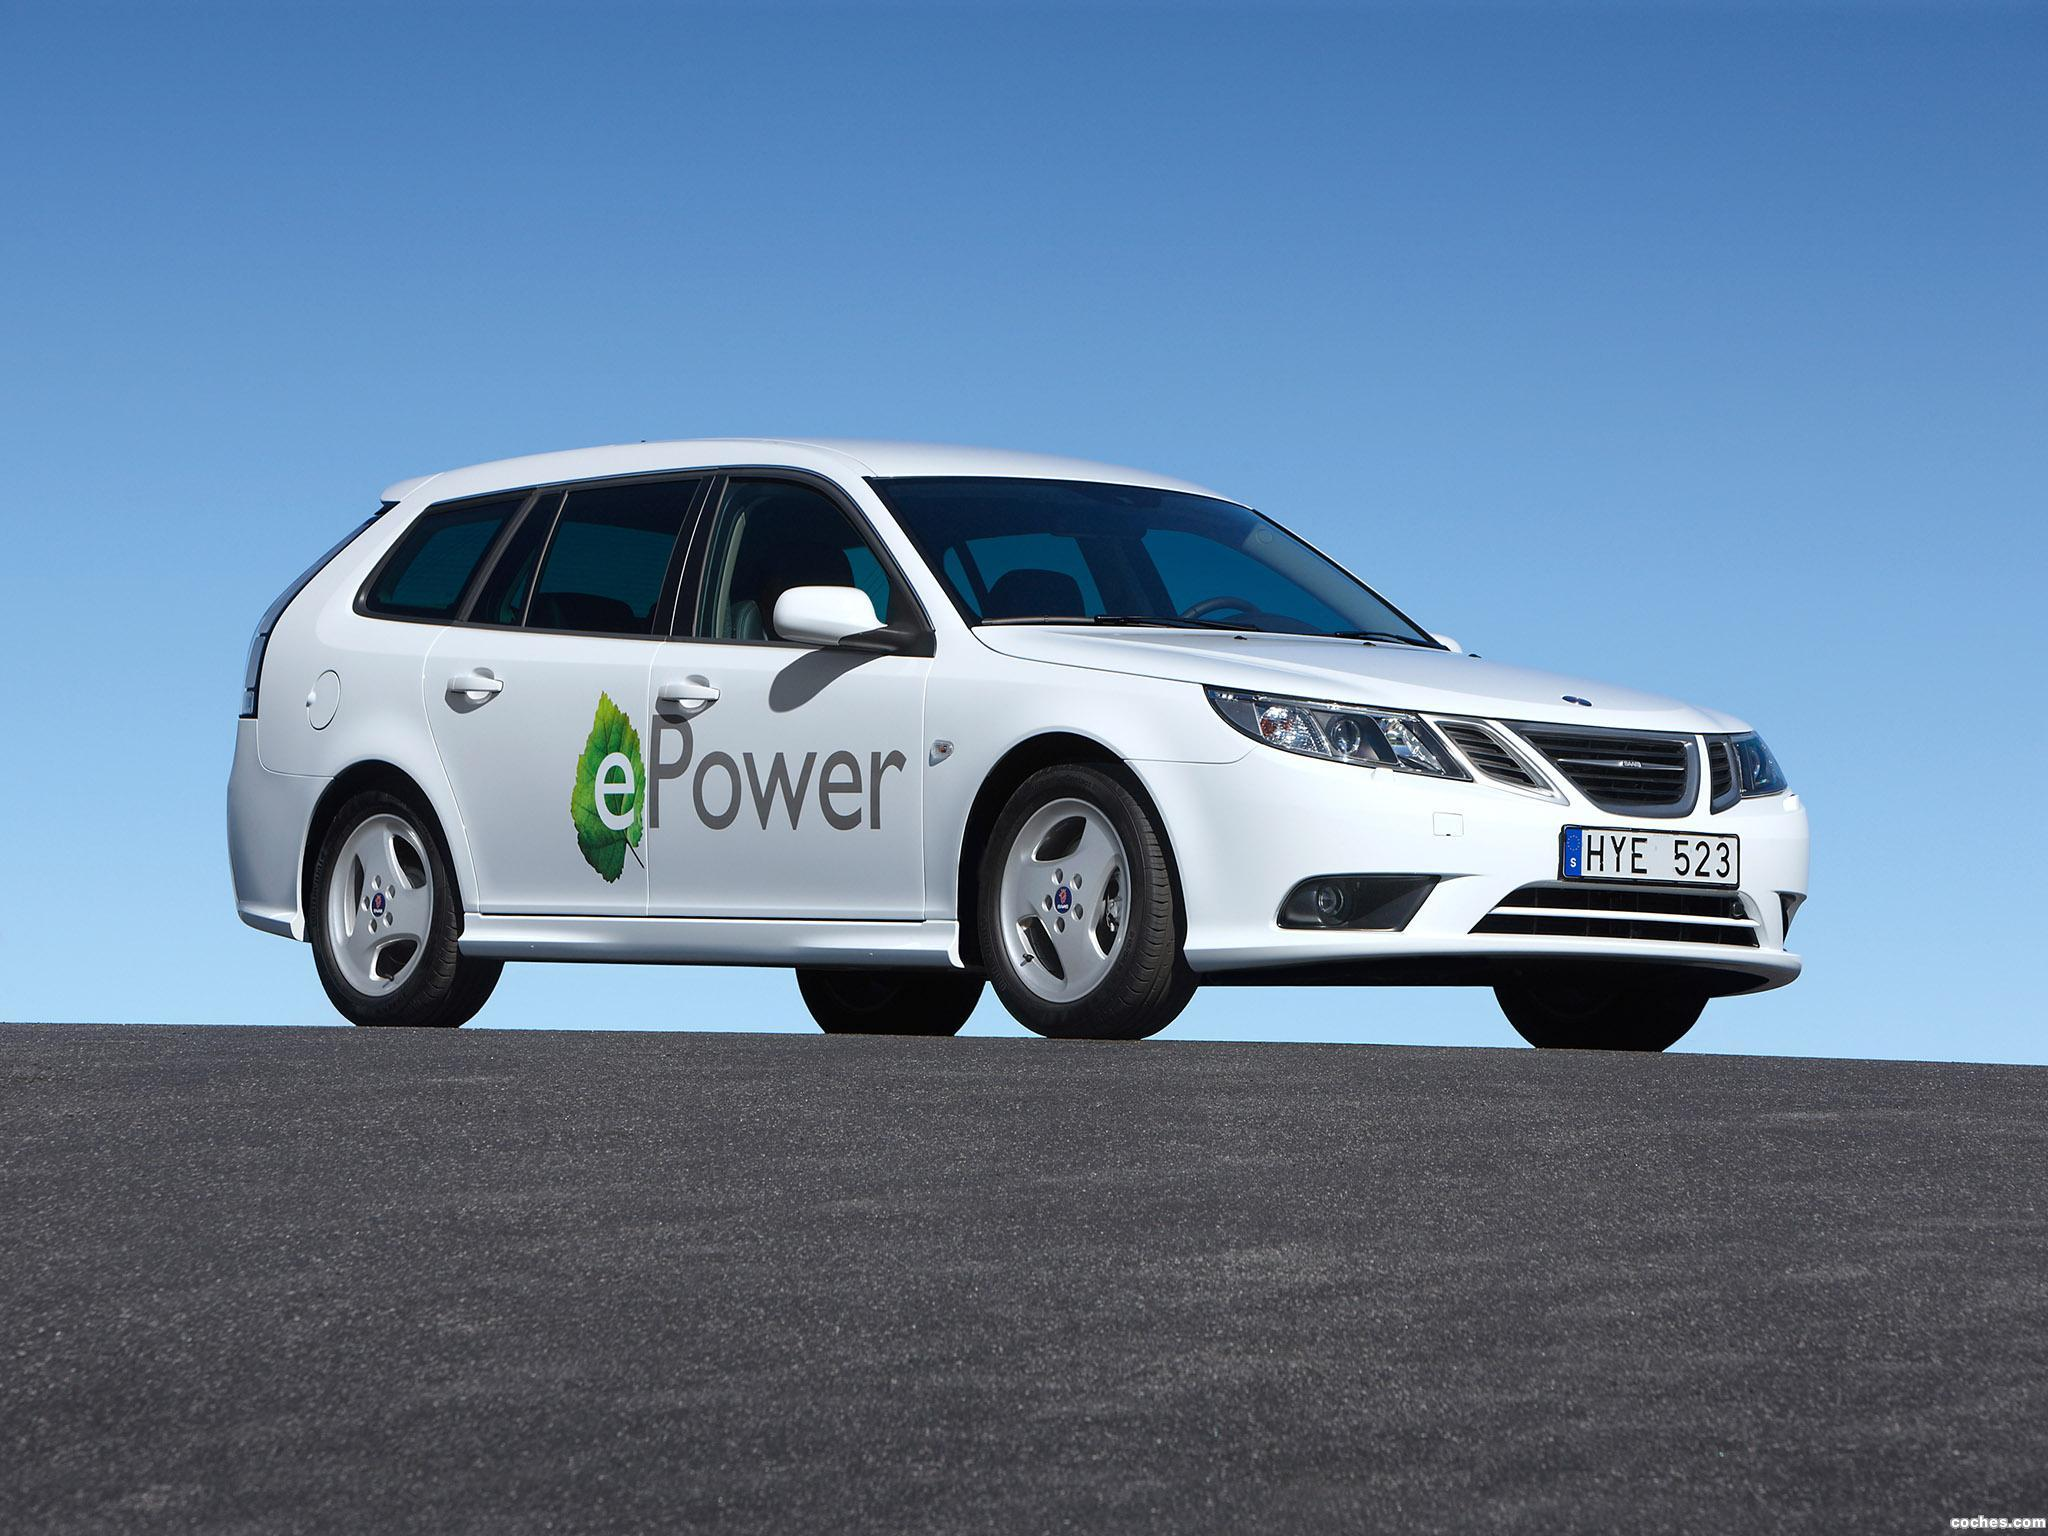 Foto 6 de Saab 9-3 ePower Concept 2010